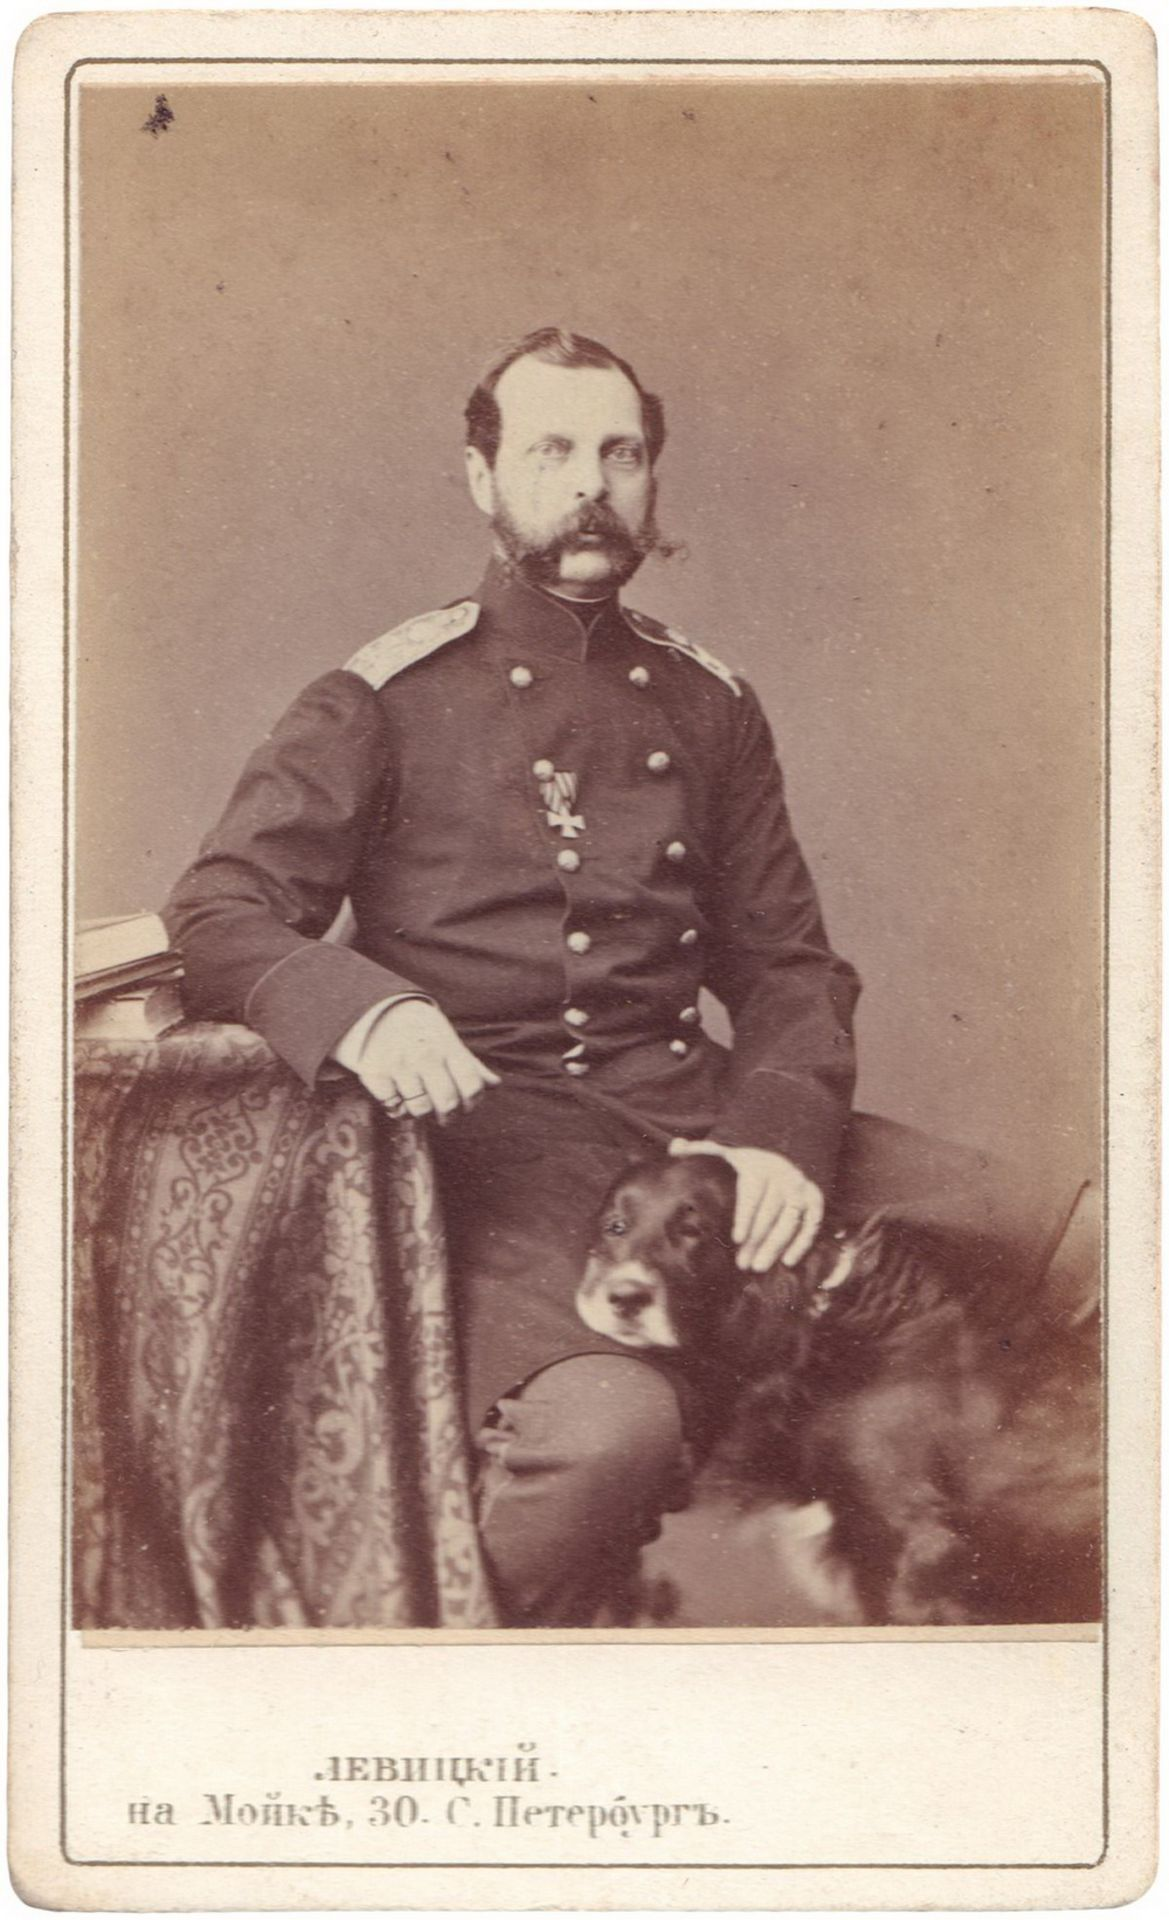 [Russian Empire. Romanov]. Levitsky, S. Portrait of Nicholas II of Russia. Author's print. 1860s. 10